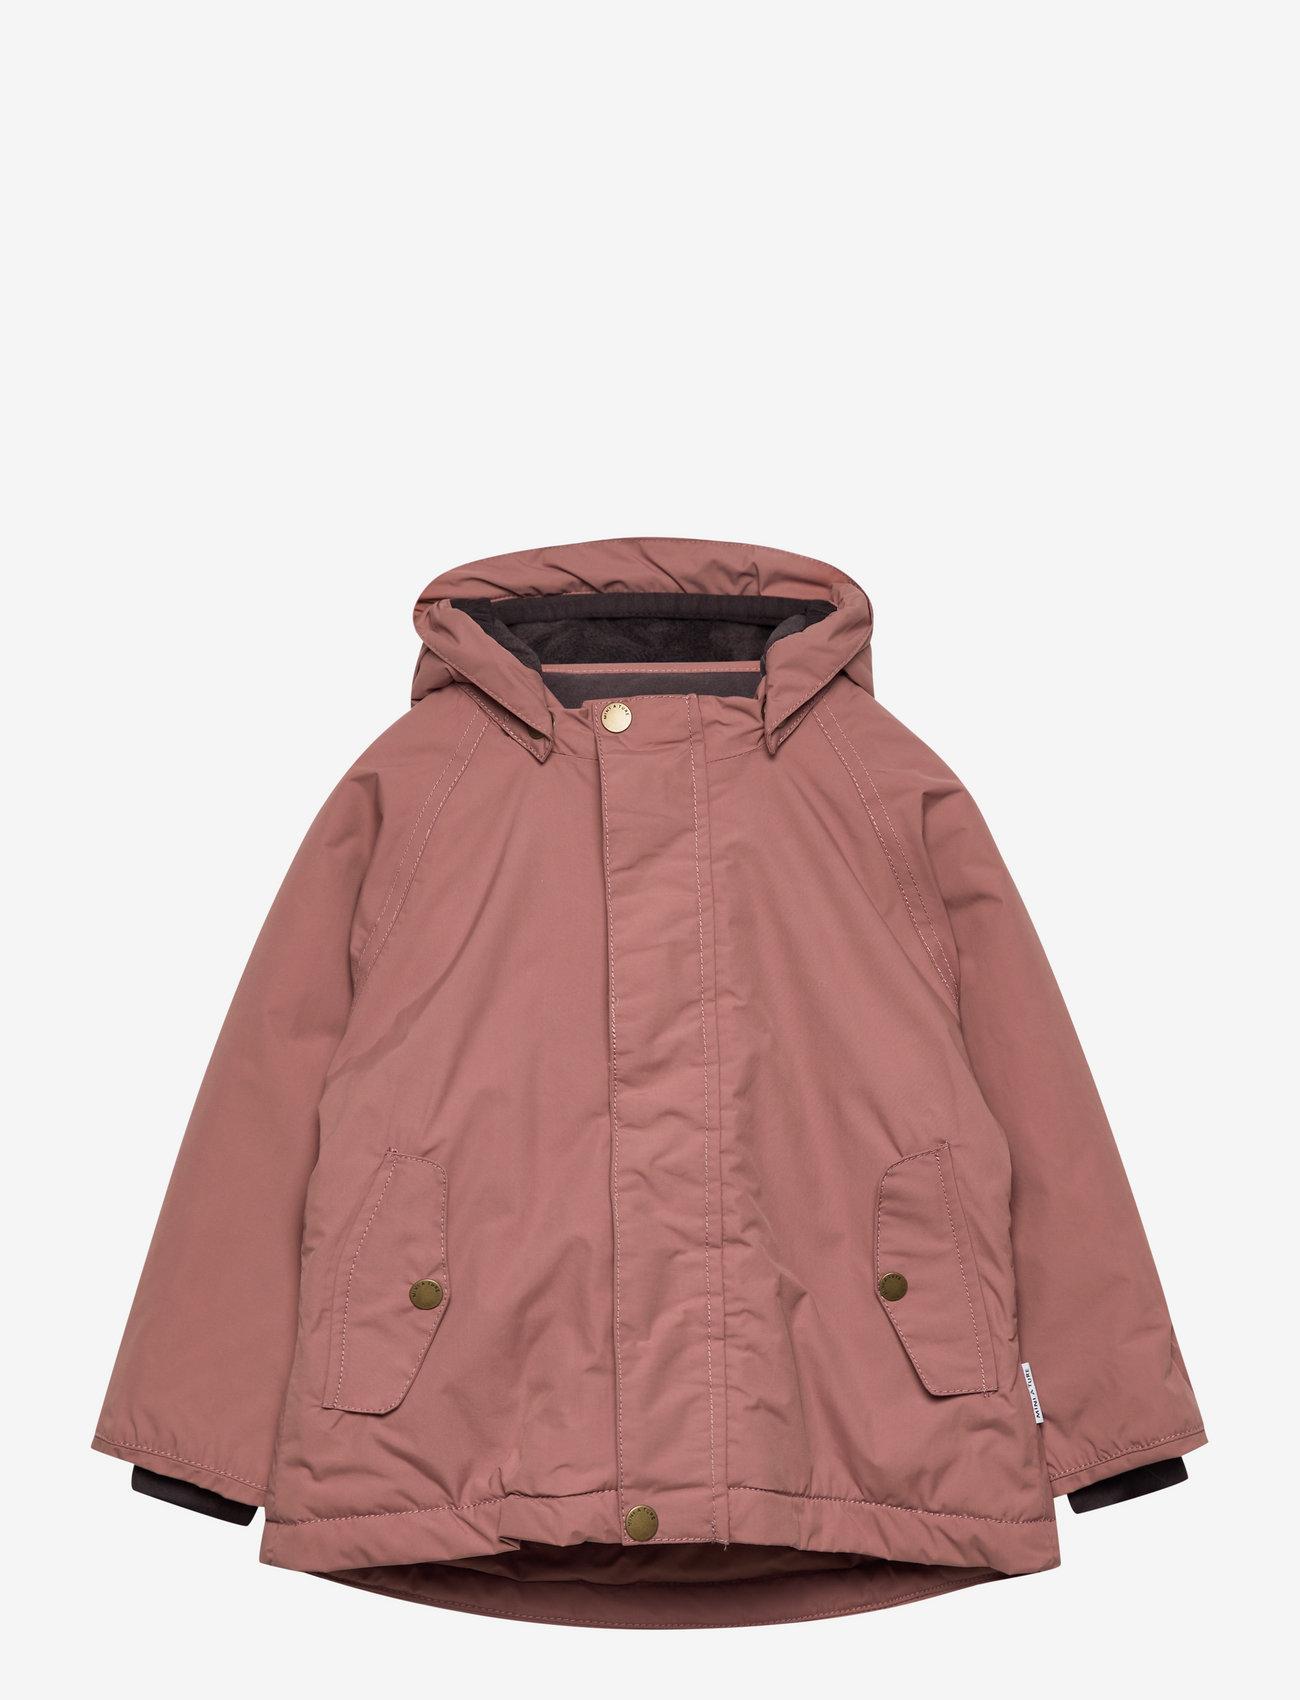 Mini A Ture - Wally Jacket, M - winter jacket - wood rose - 0